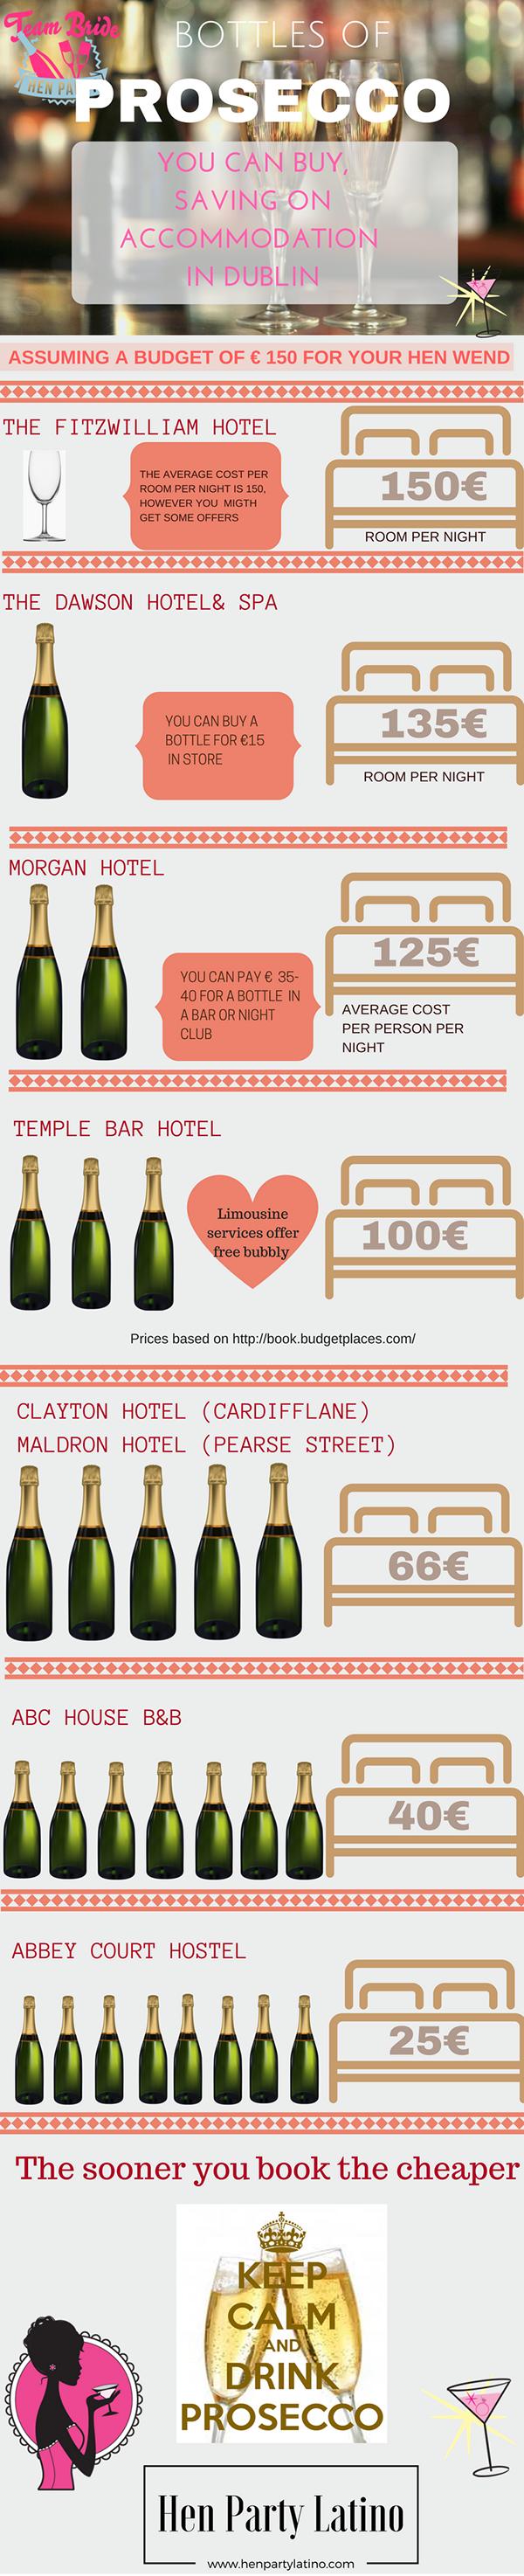 accommodation-vs-prosecco Infographic